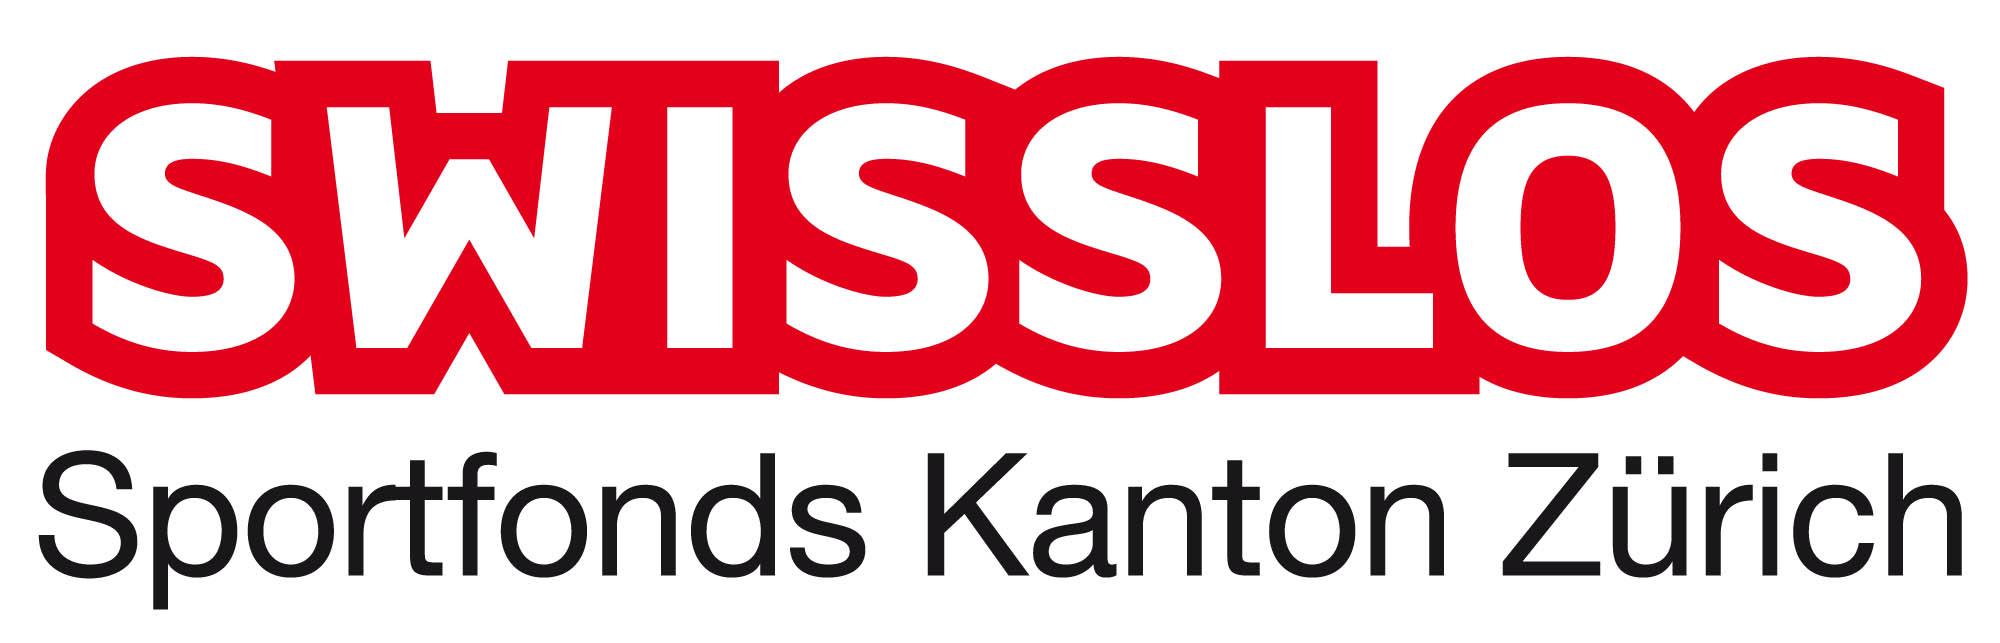 Swisslos Sportfonds